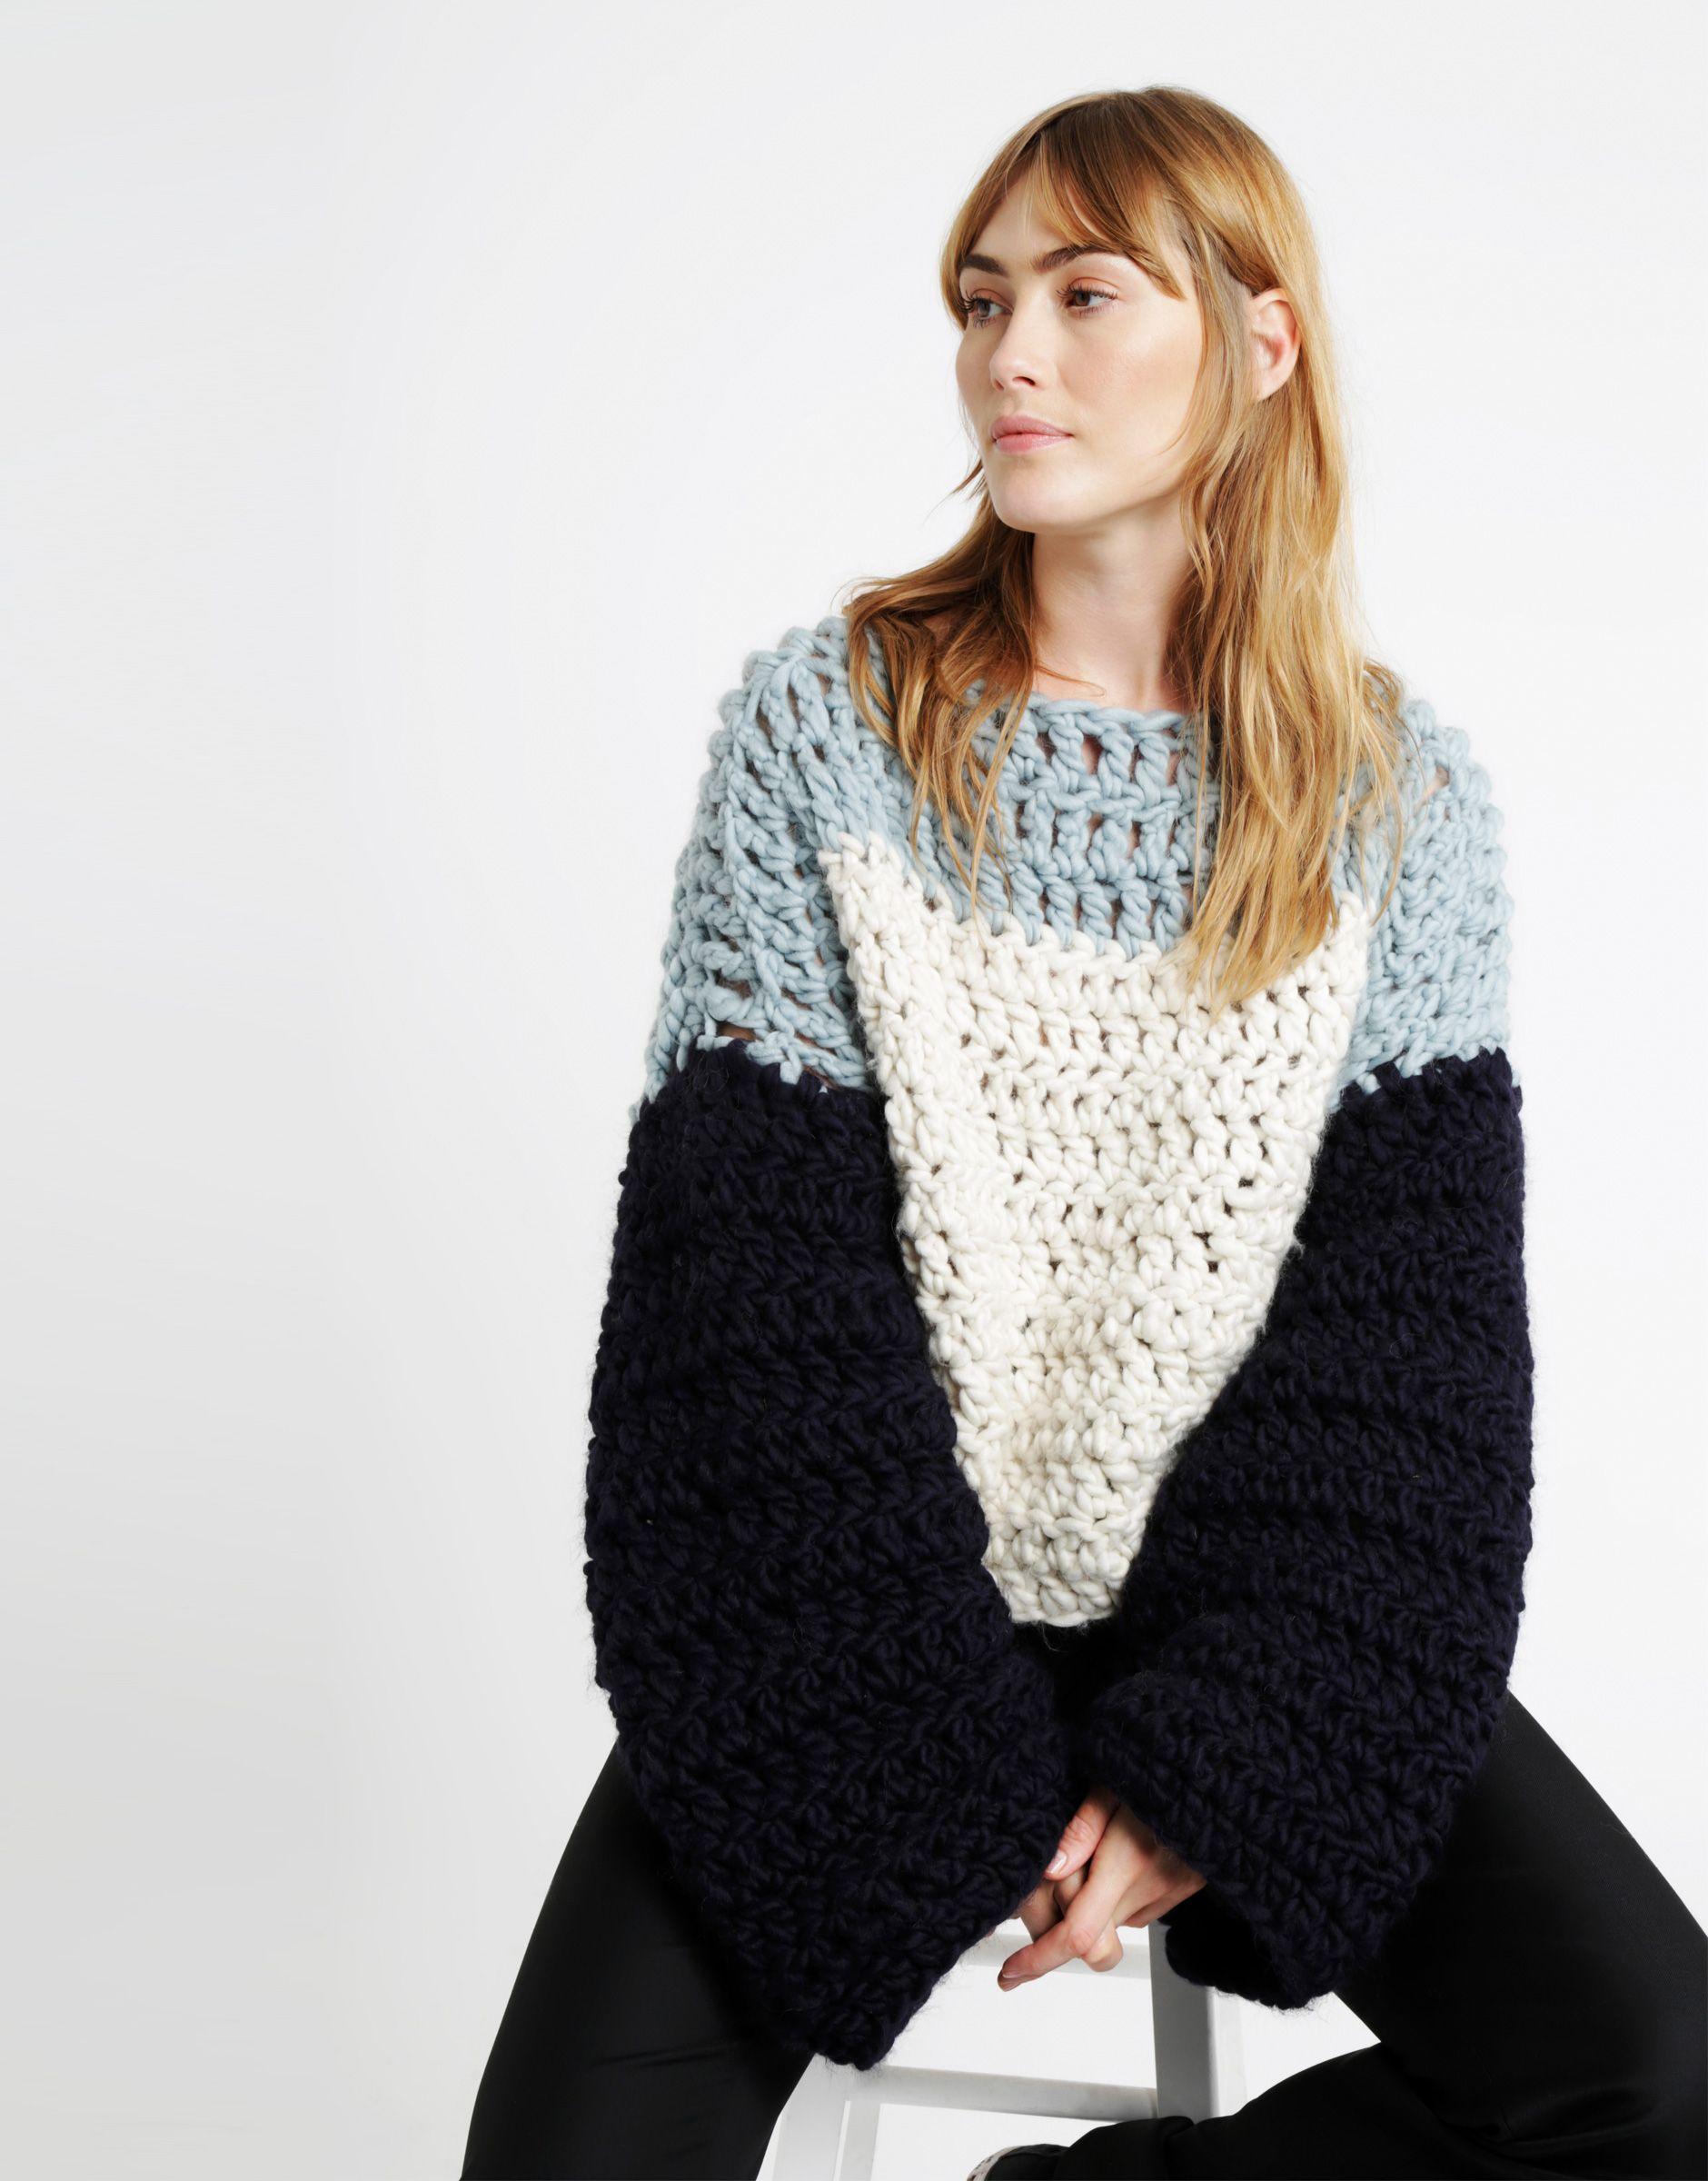 Handy Dandy Sweater | @woolandthegang | Crochetwear II | Tricotar ...